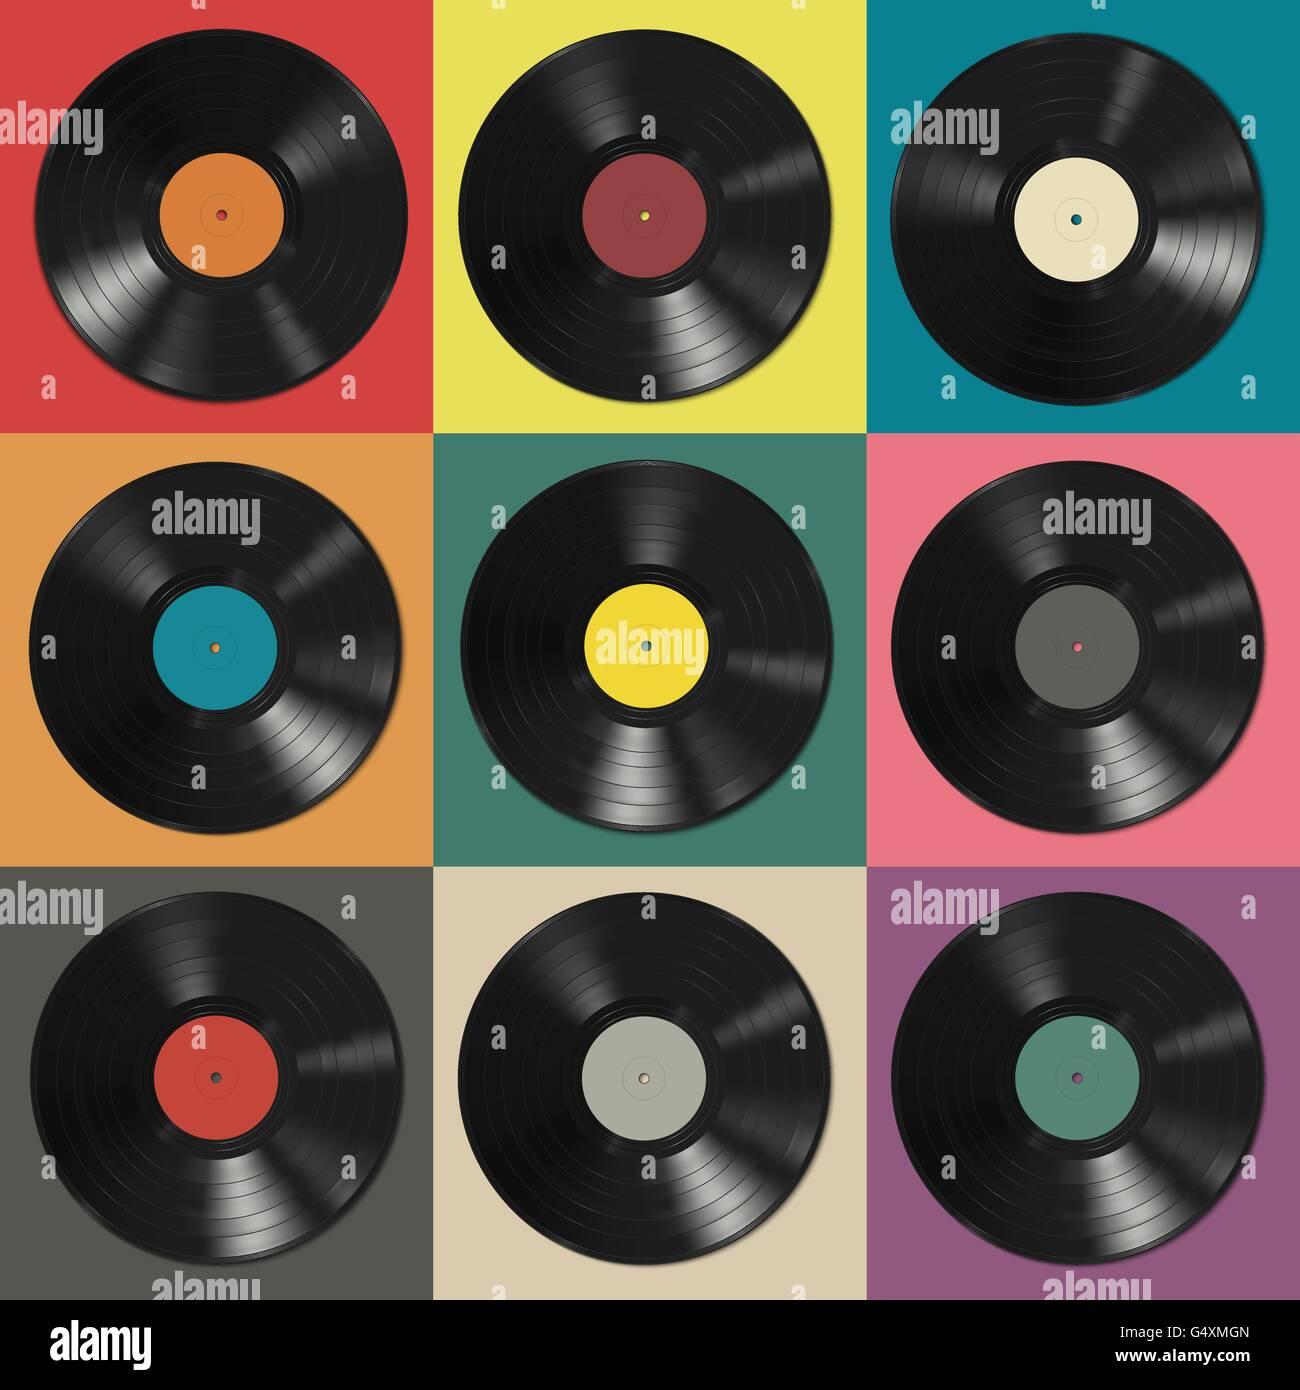 Vinyl Schallplatten Mit Bunten Etiketten Vektor Abbildung